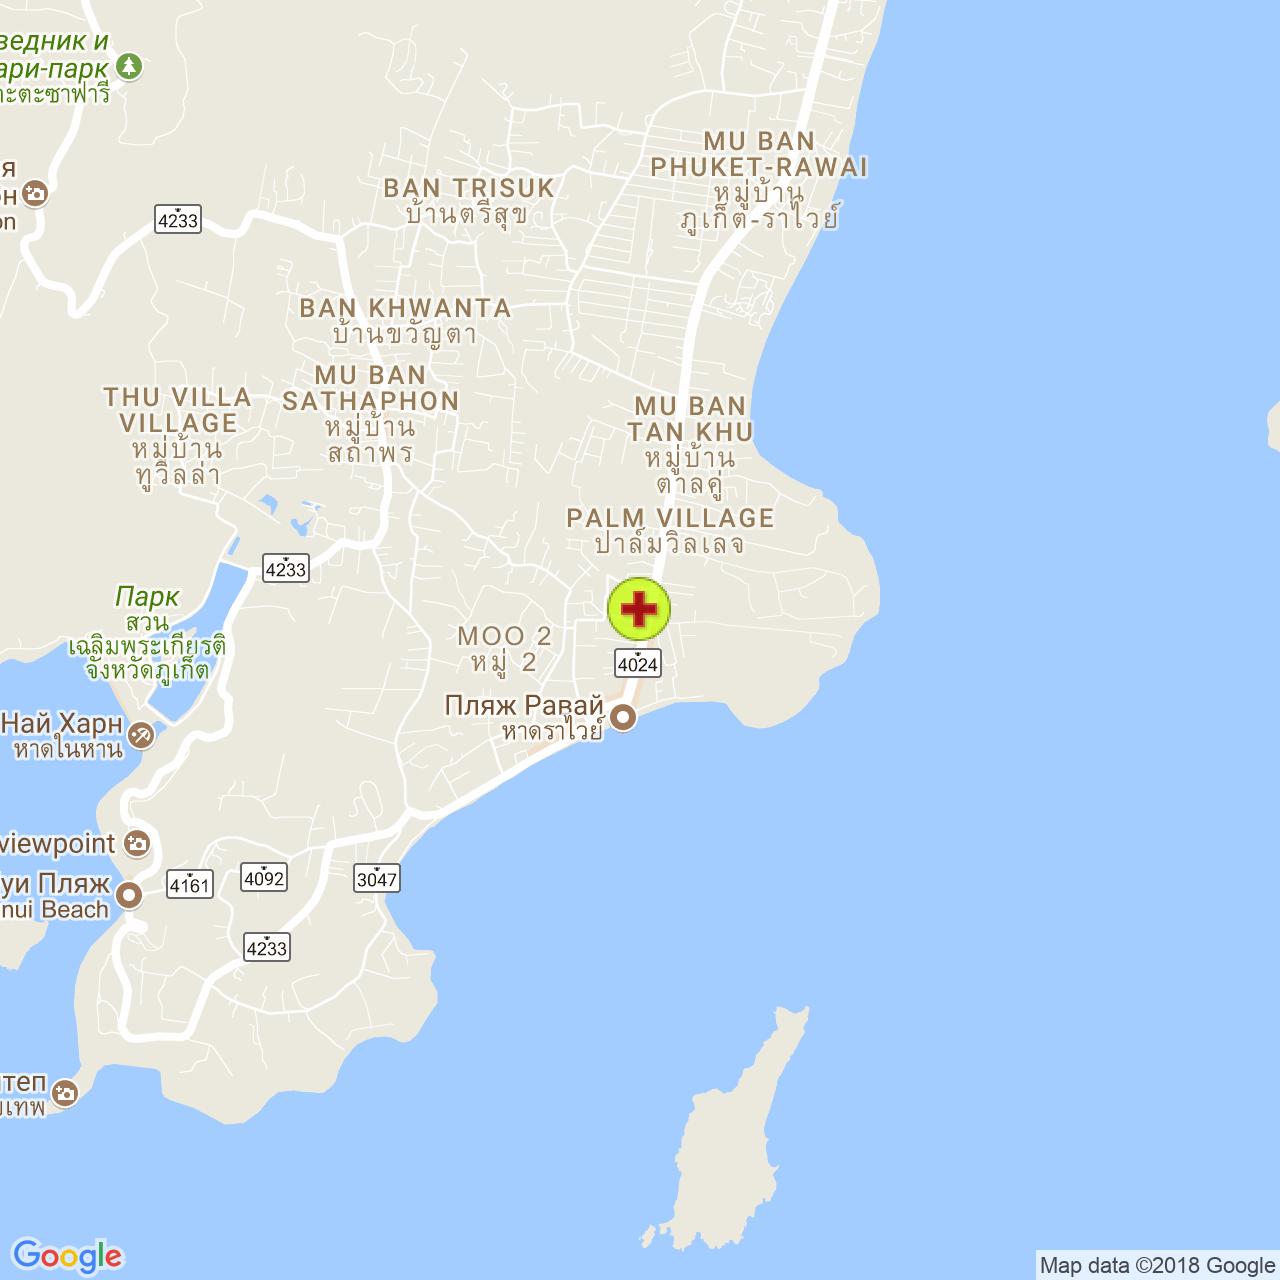 Клиника Андаман (Andaman Clinic) на карте Пхукета